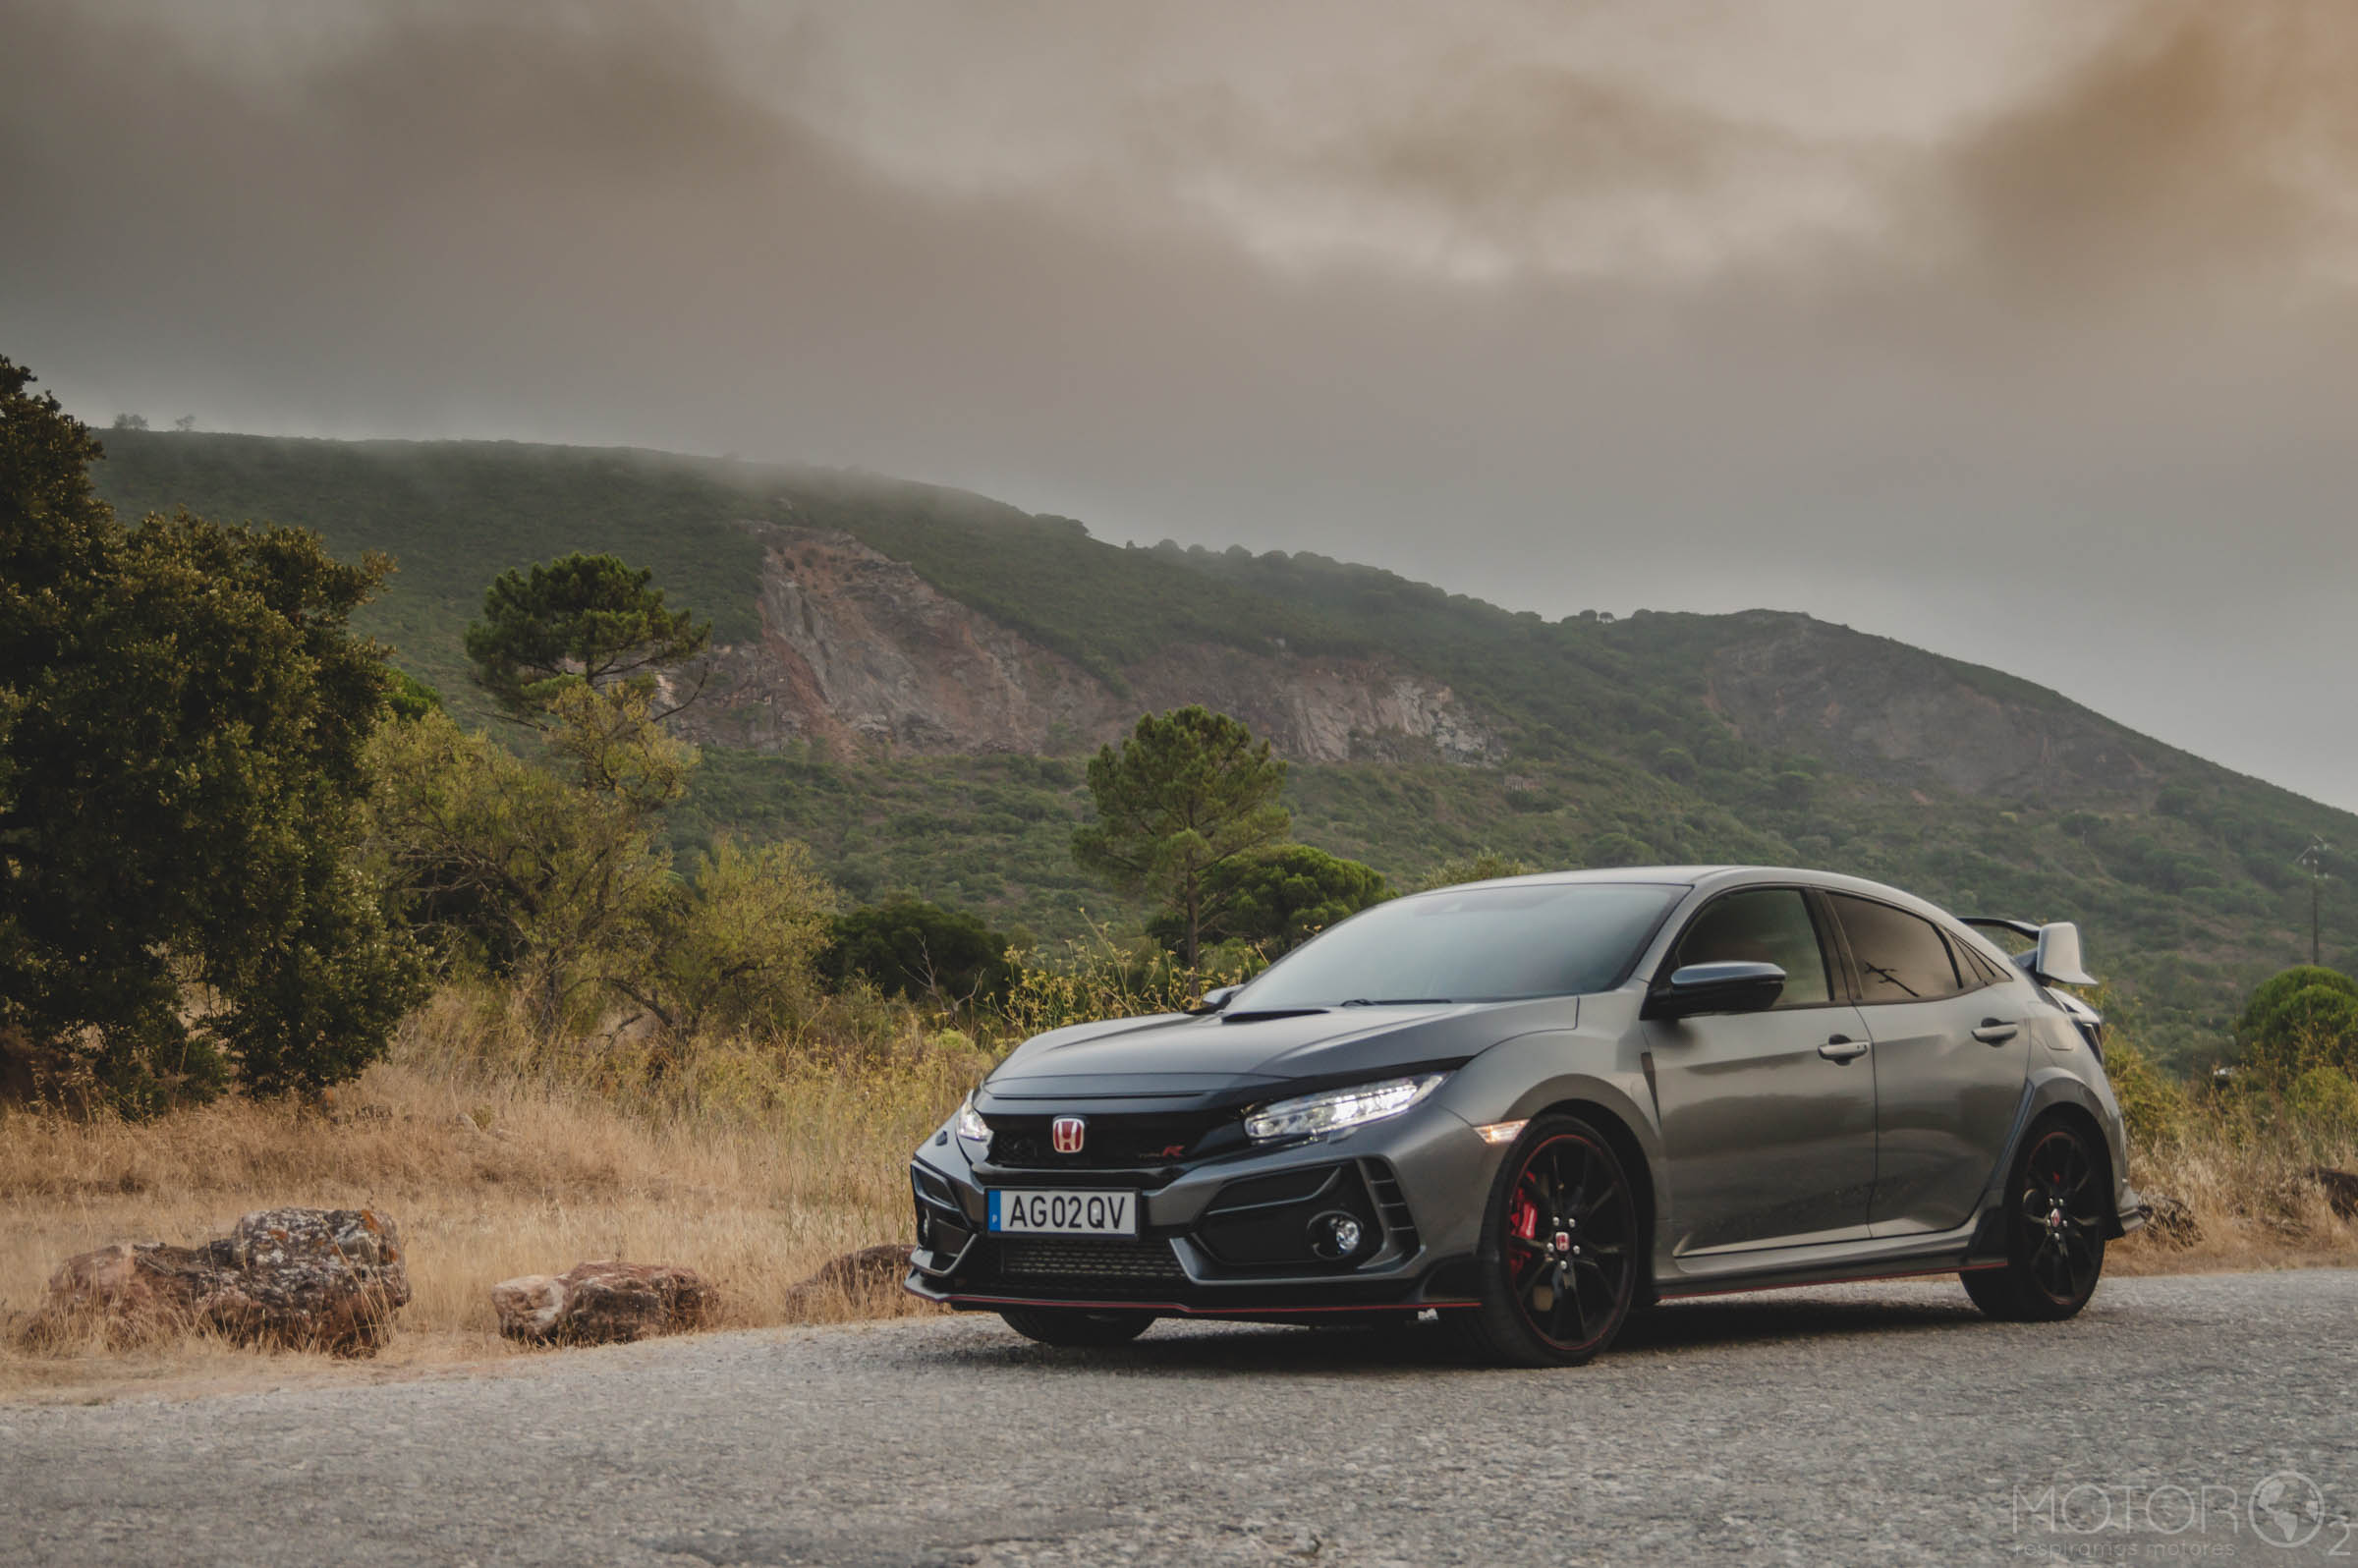 Teste ao renovado (e ultra-eficaz) Honda Civic Type-R